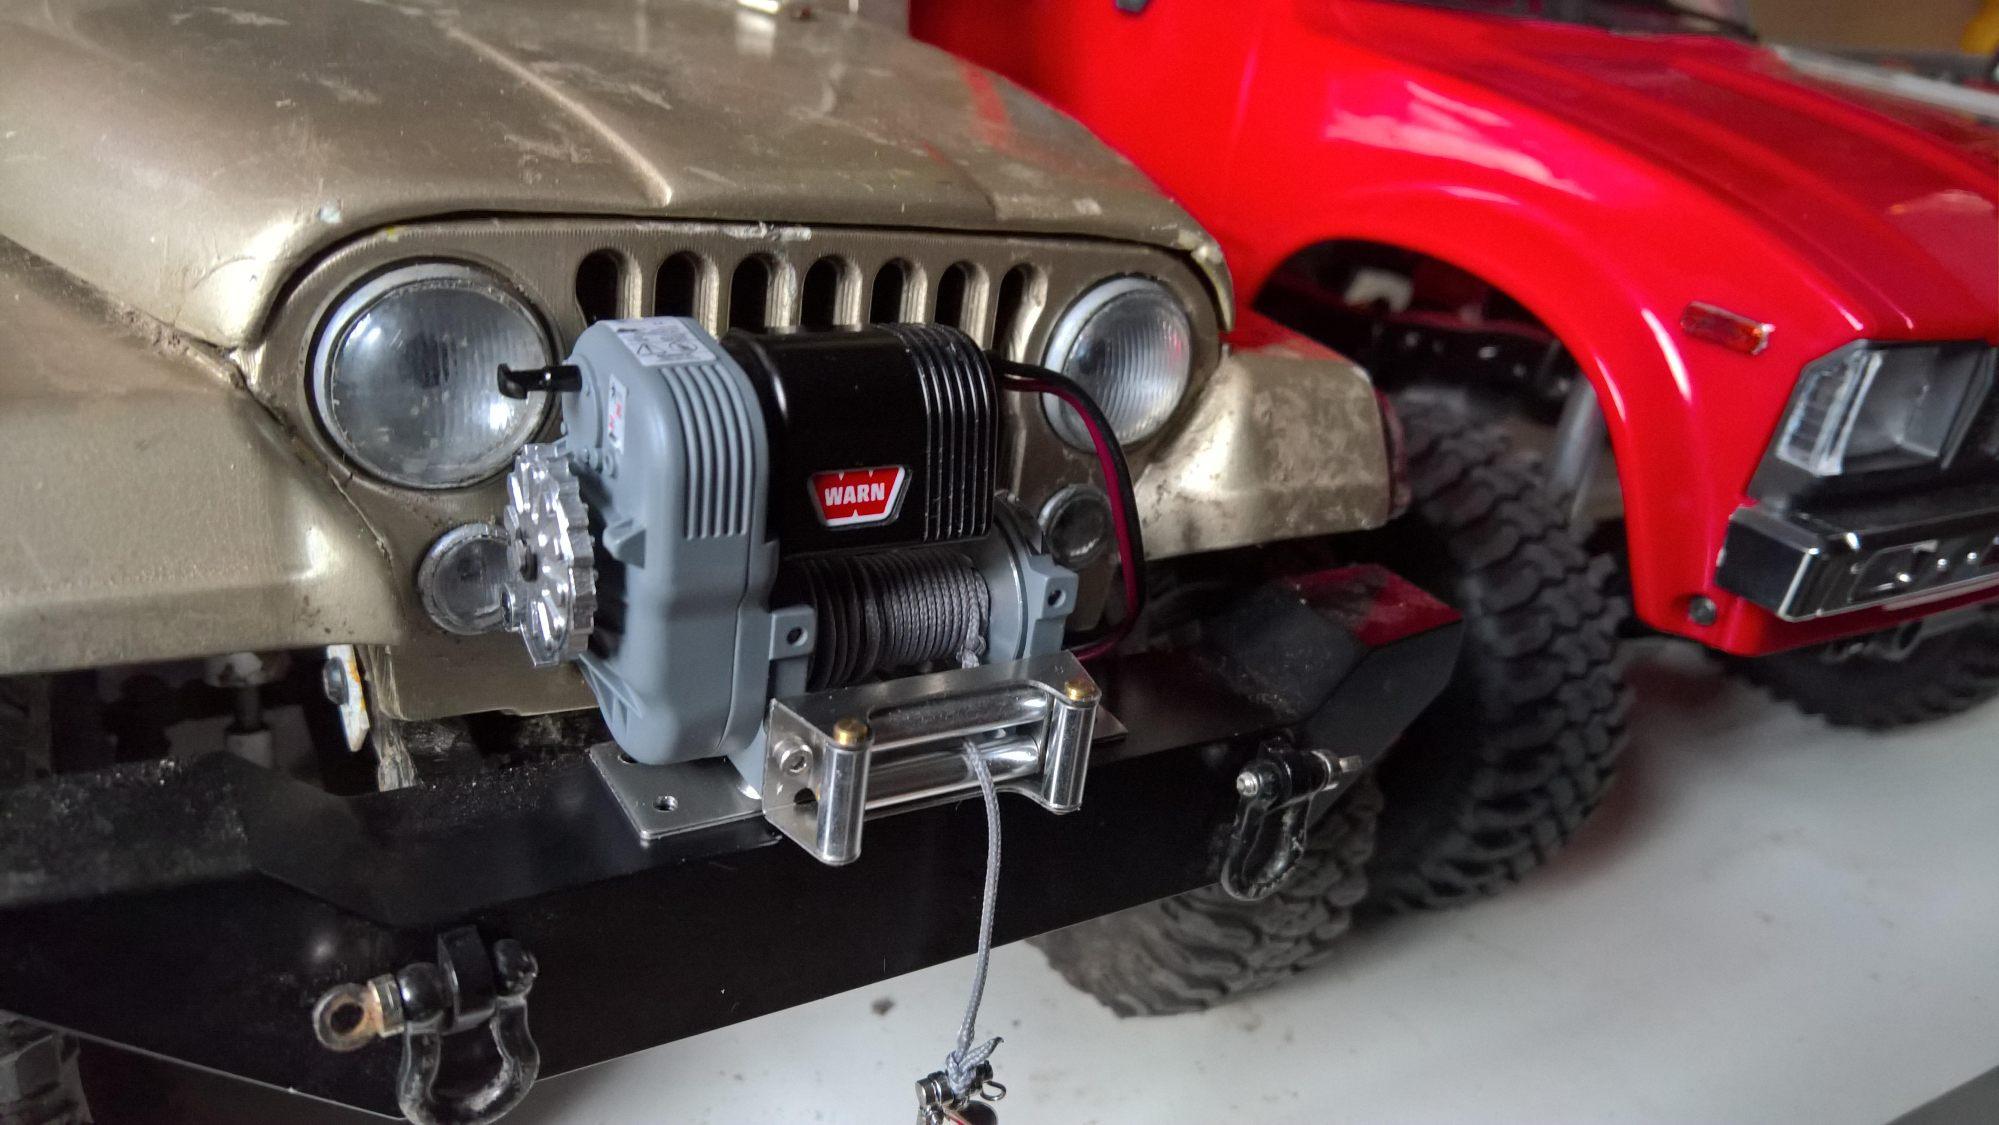 hight resolution of warn winch bumper